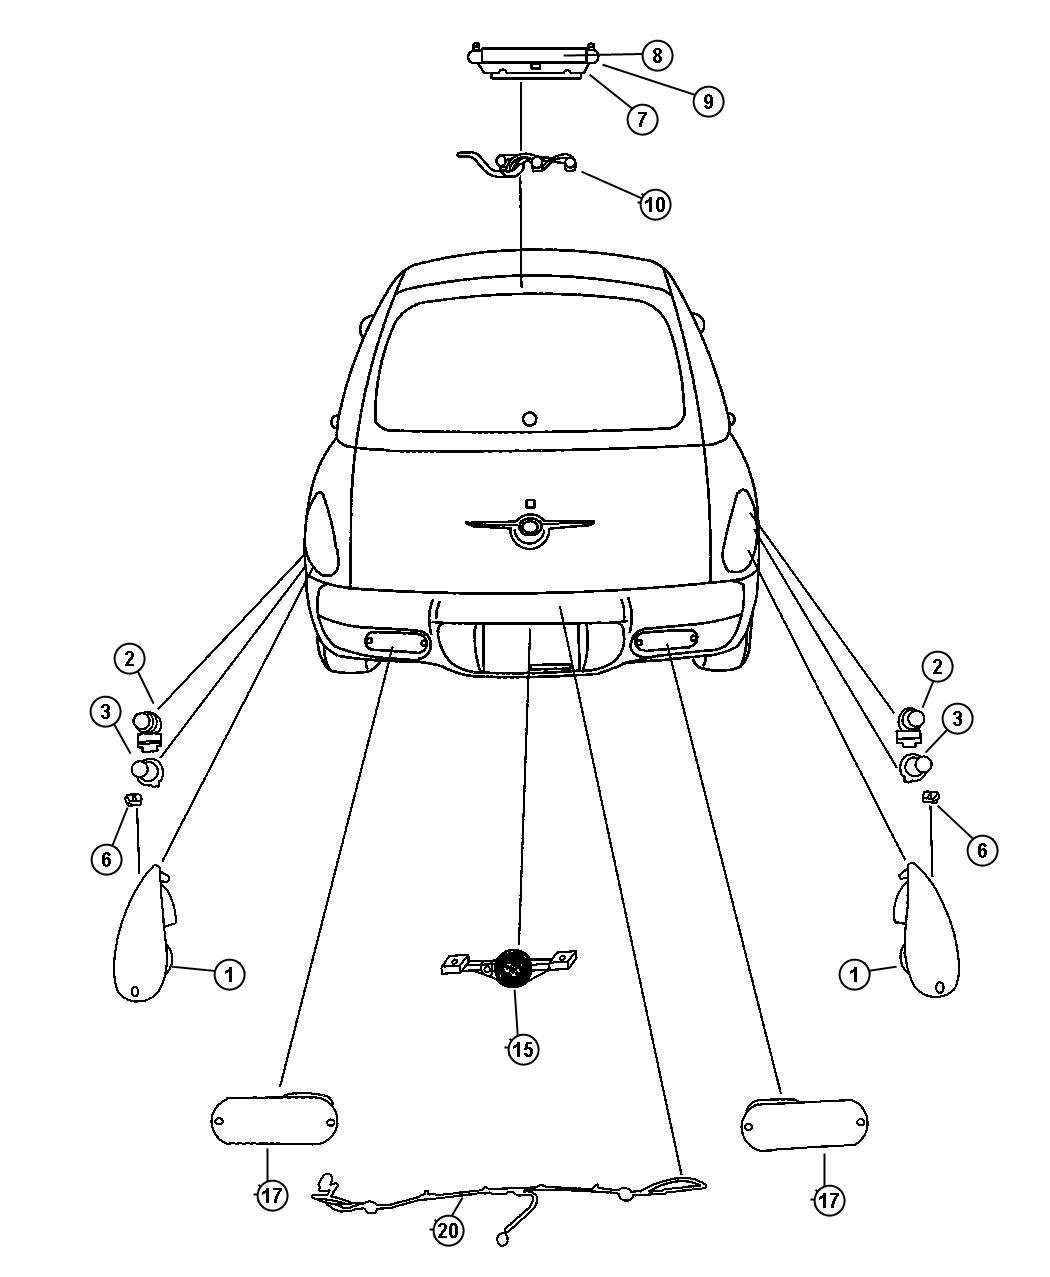 Chrysler Pt Cruiser Lamp Backup Lamps Wiring